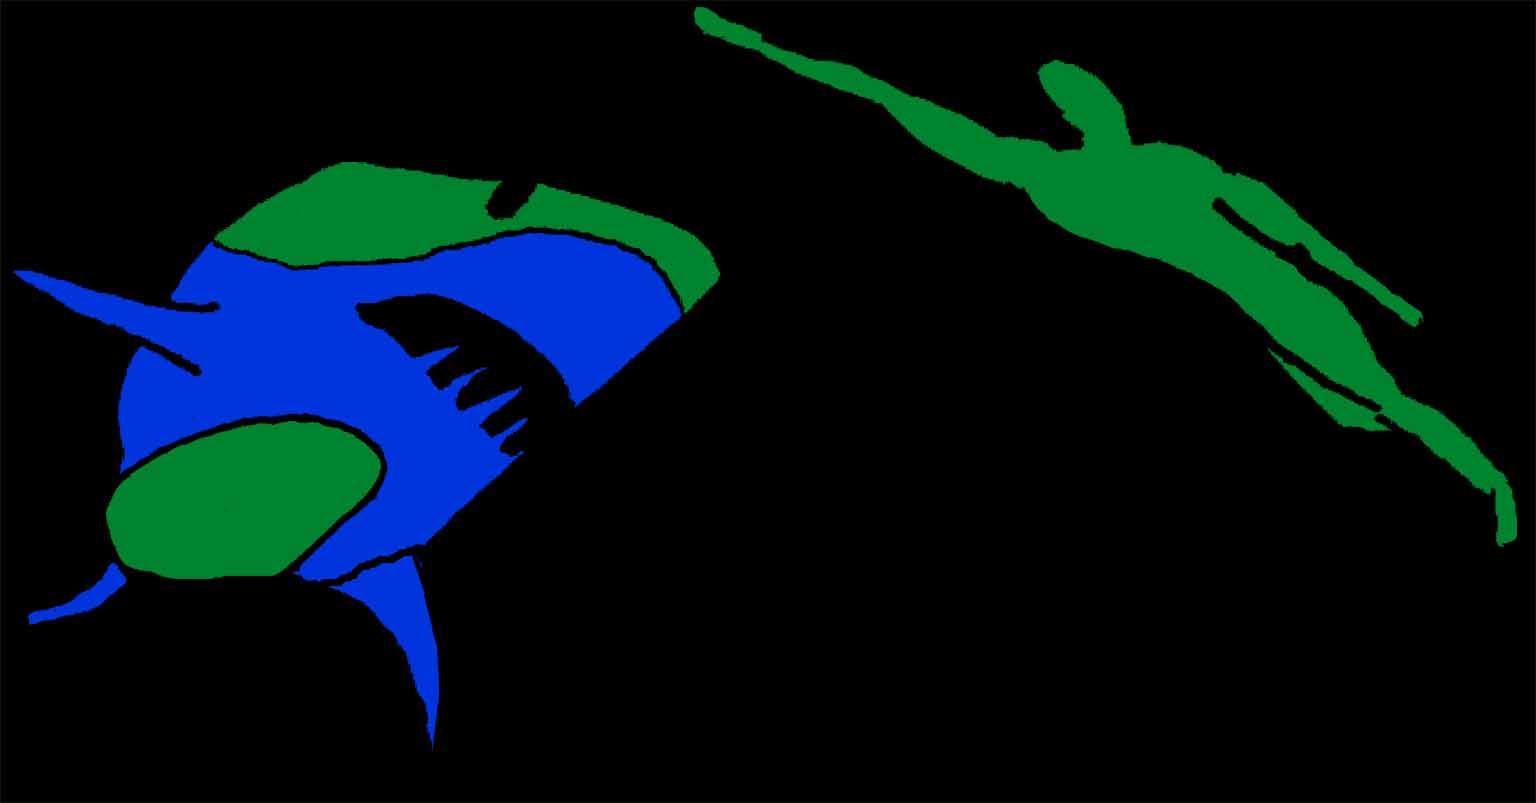 Shark vs swimmer stencil copy